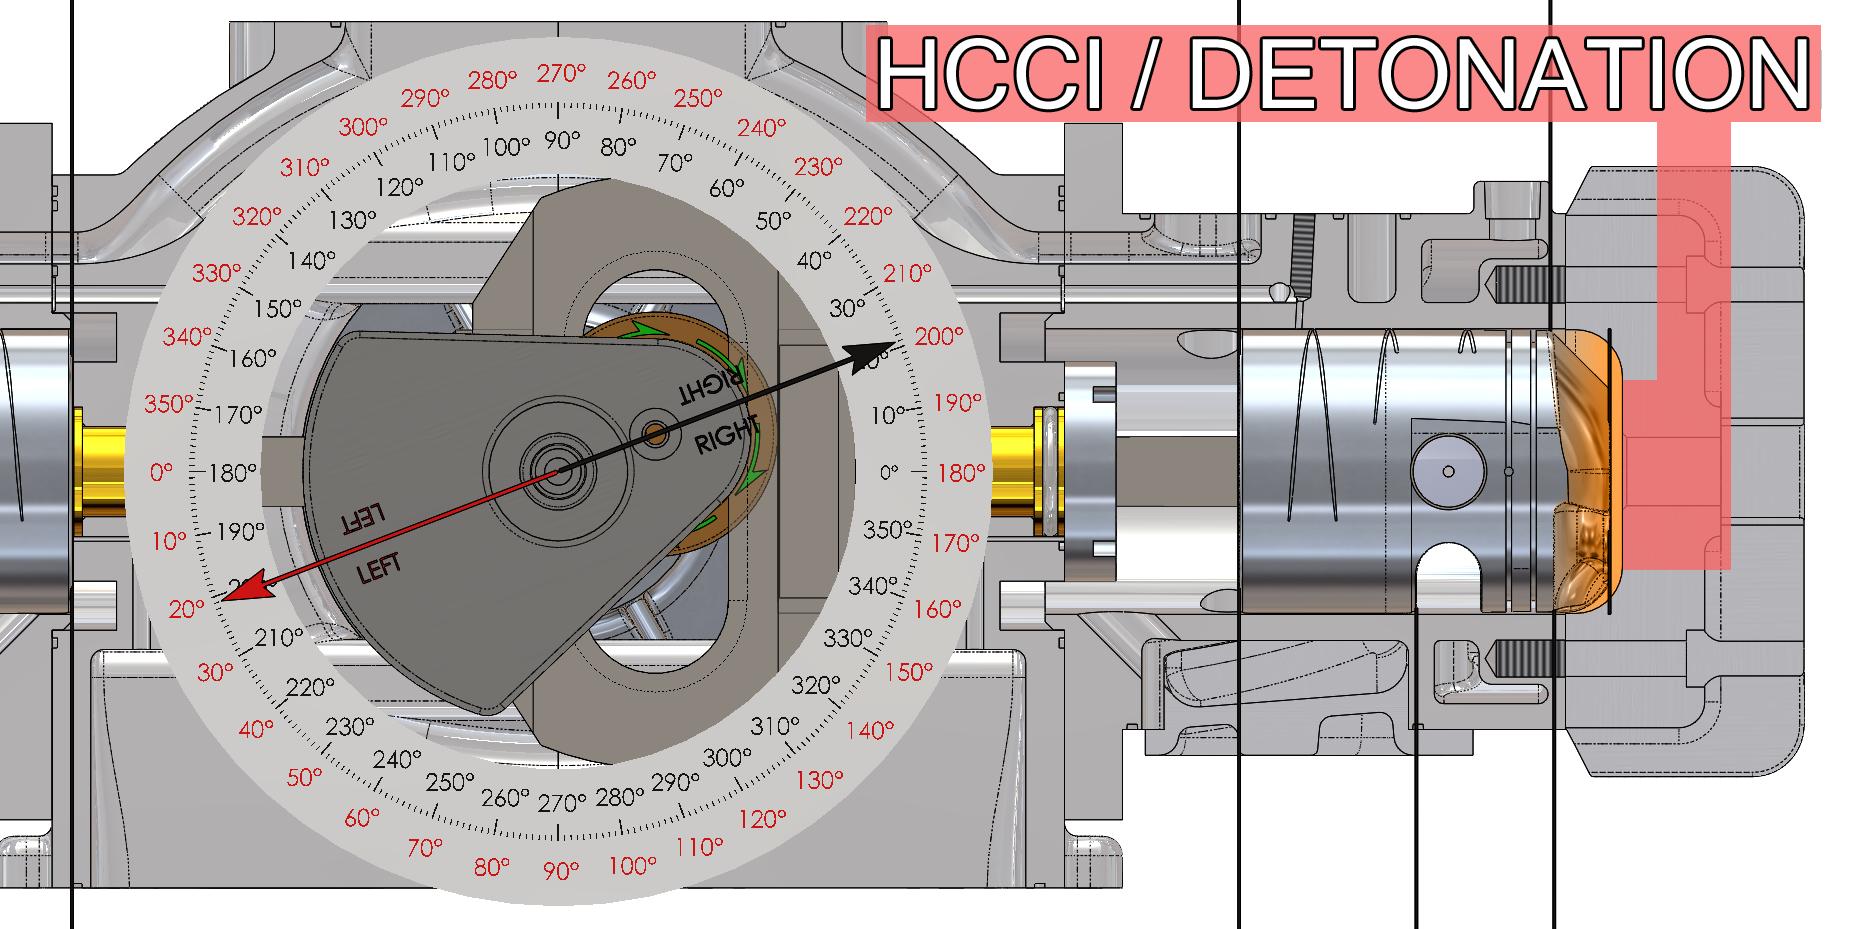 HCCI/Detonation Right Cylinder